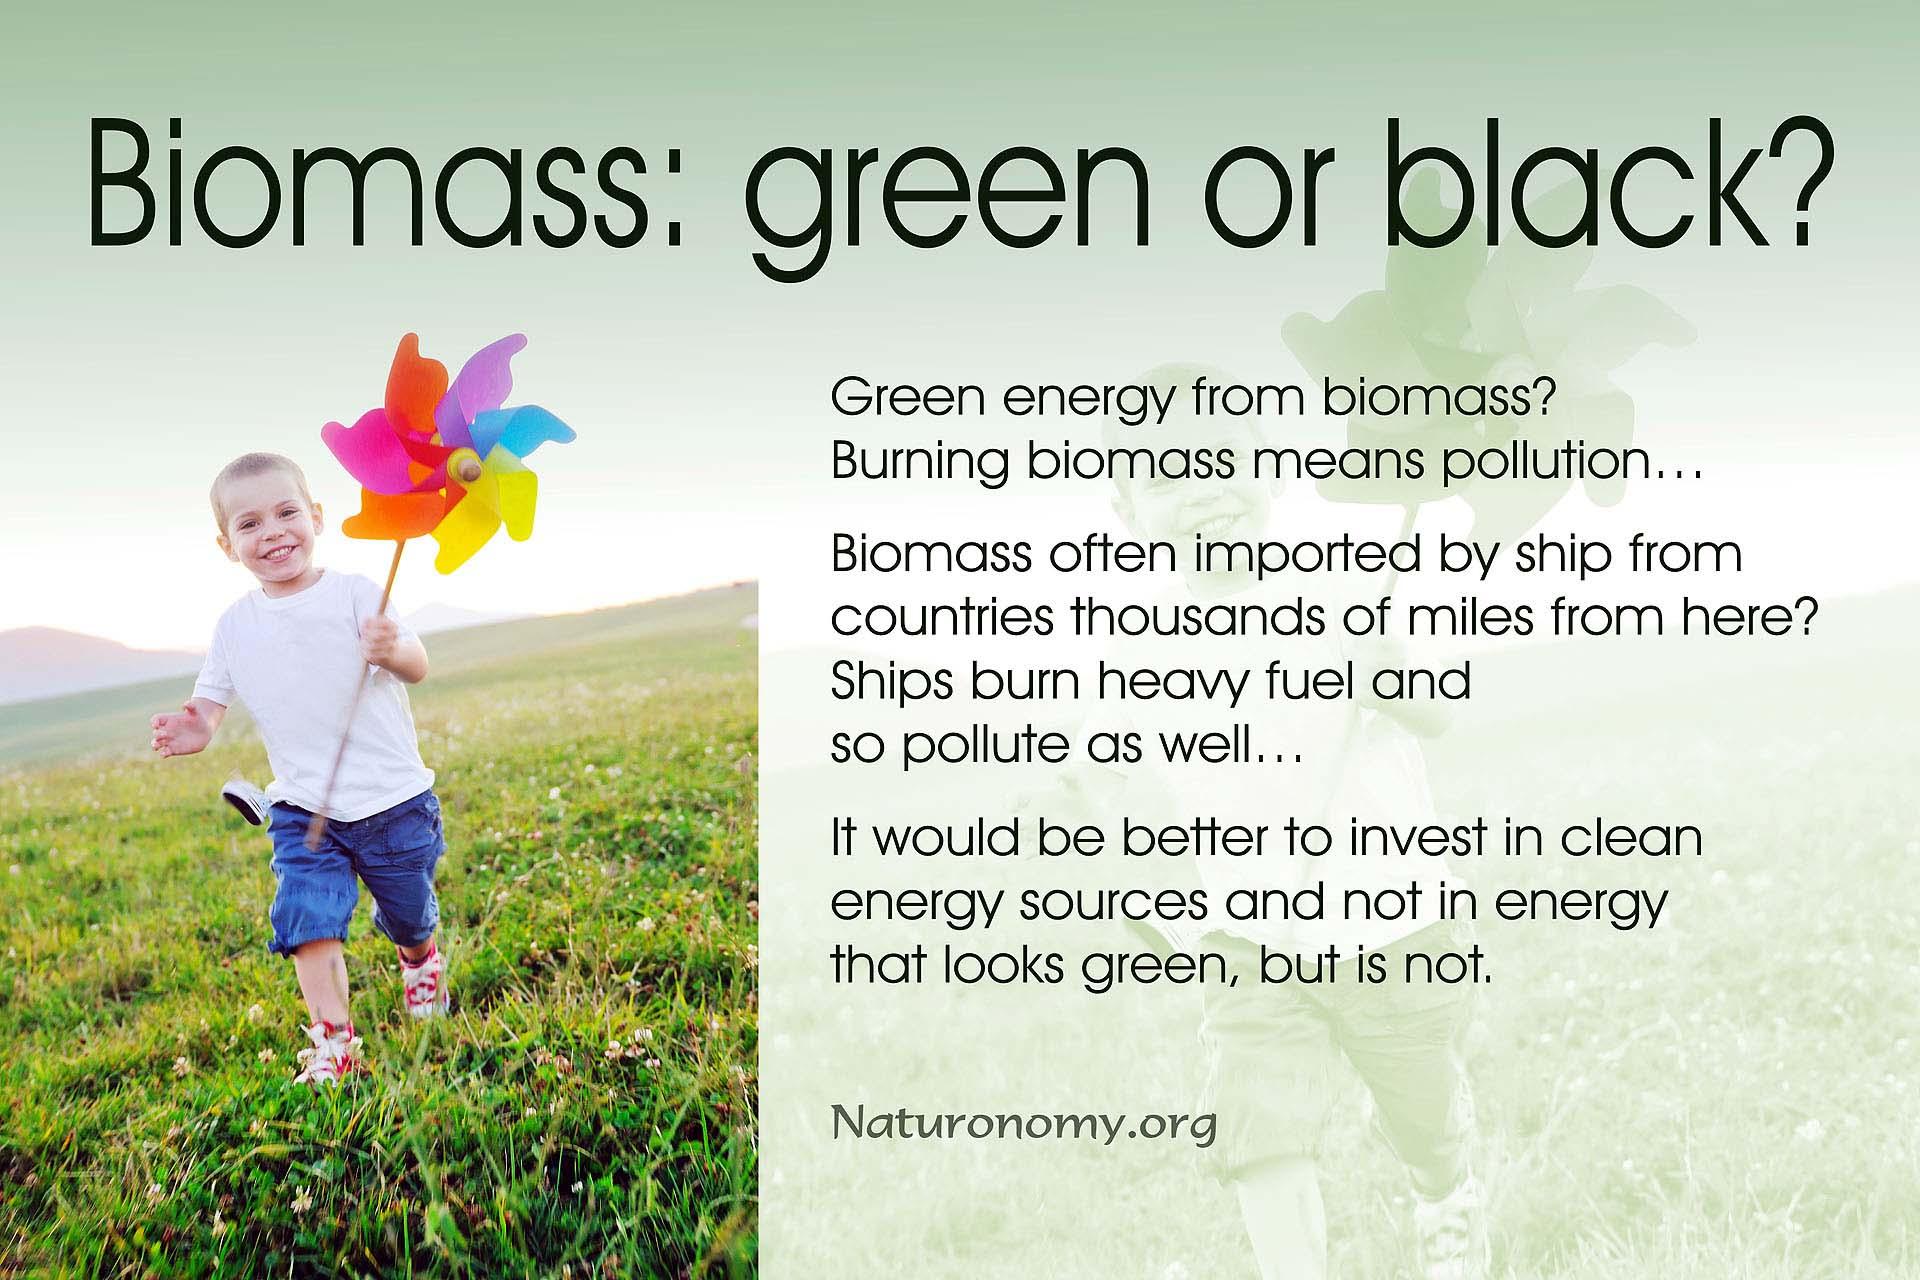 Biomass: green or black?